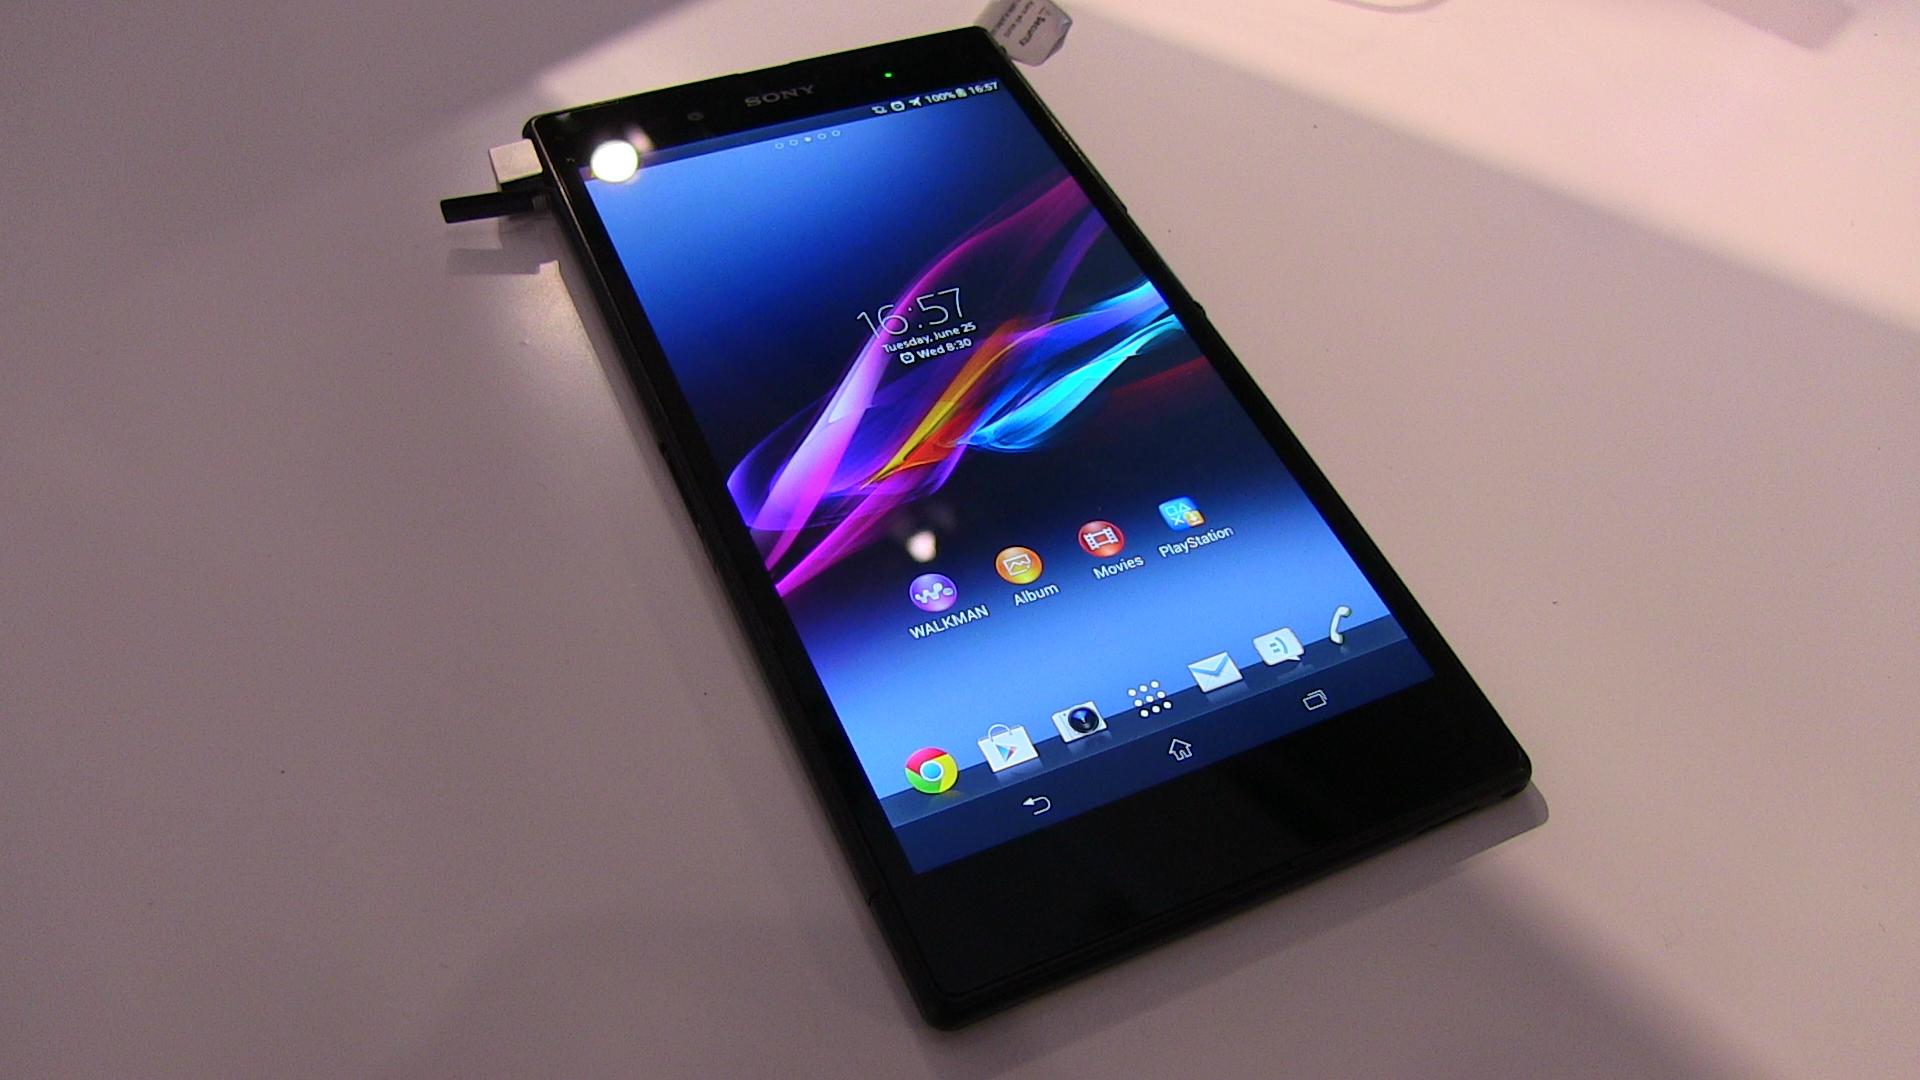 Sony Xperia Z Ultra: Funktionsweise des Stylus im Video erklärt